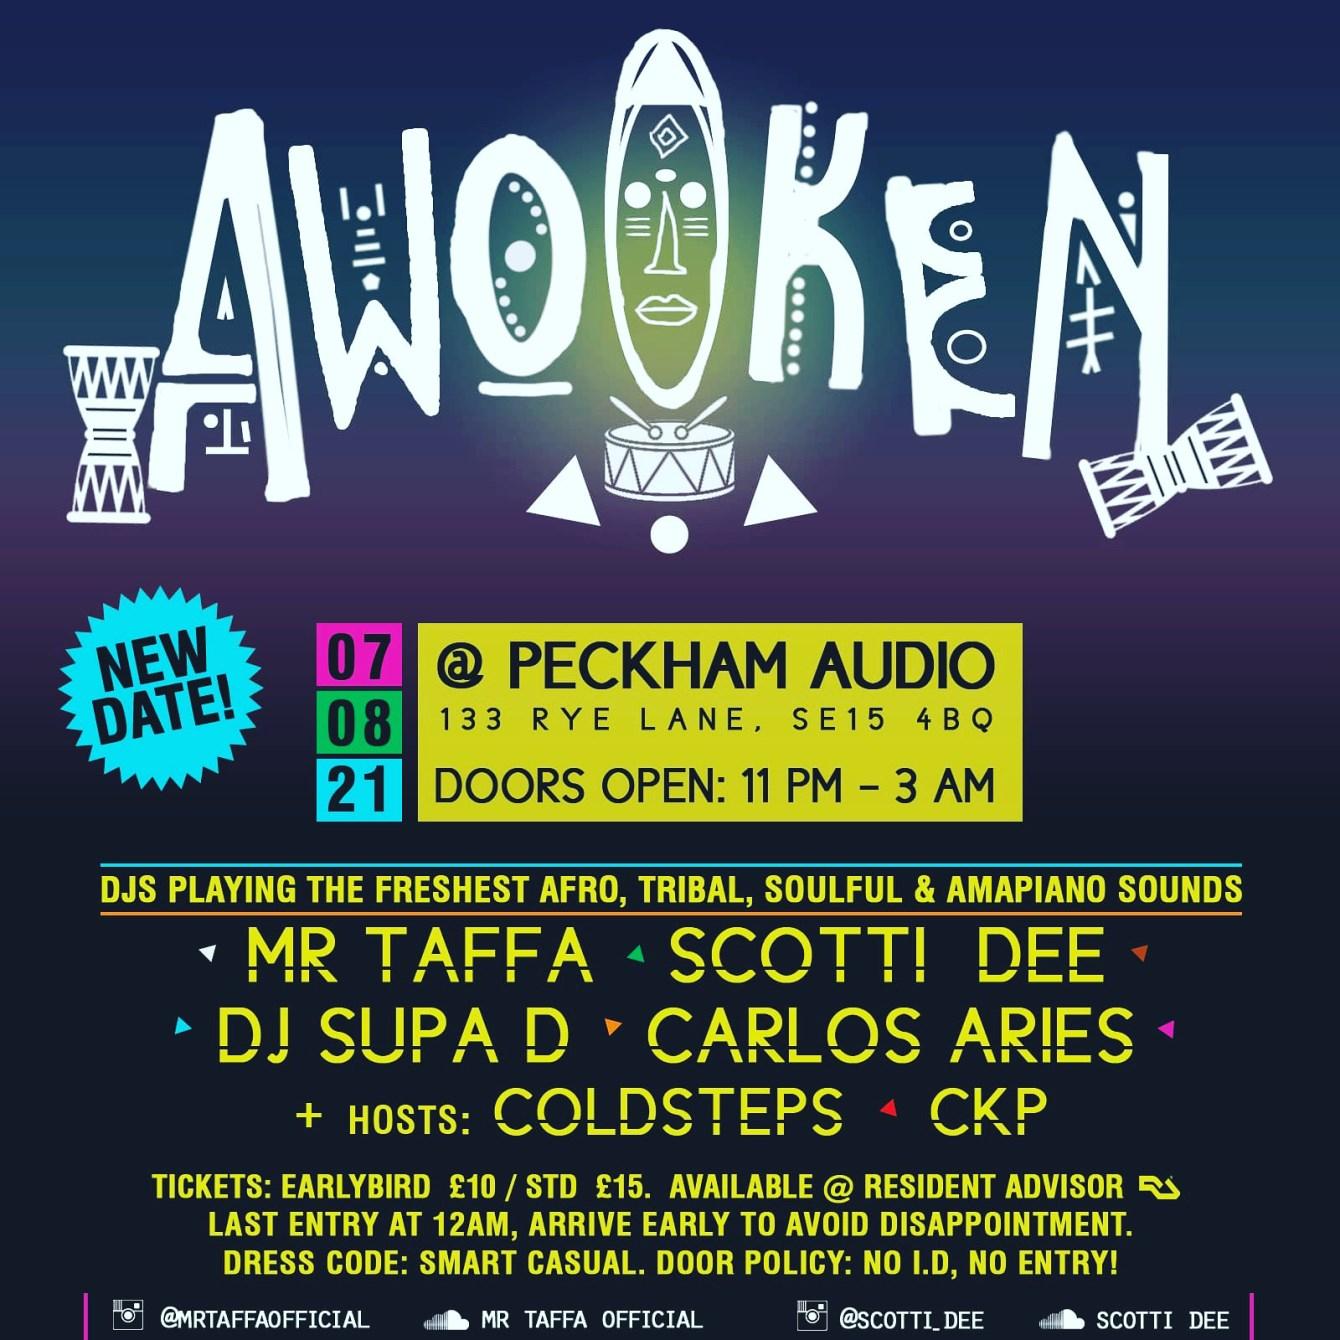 Awoken - Flyer front